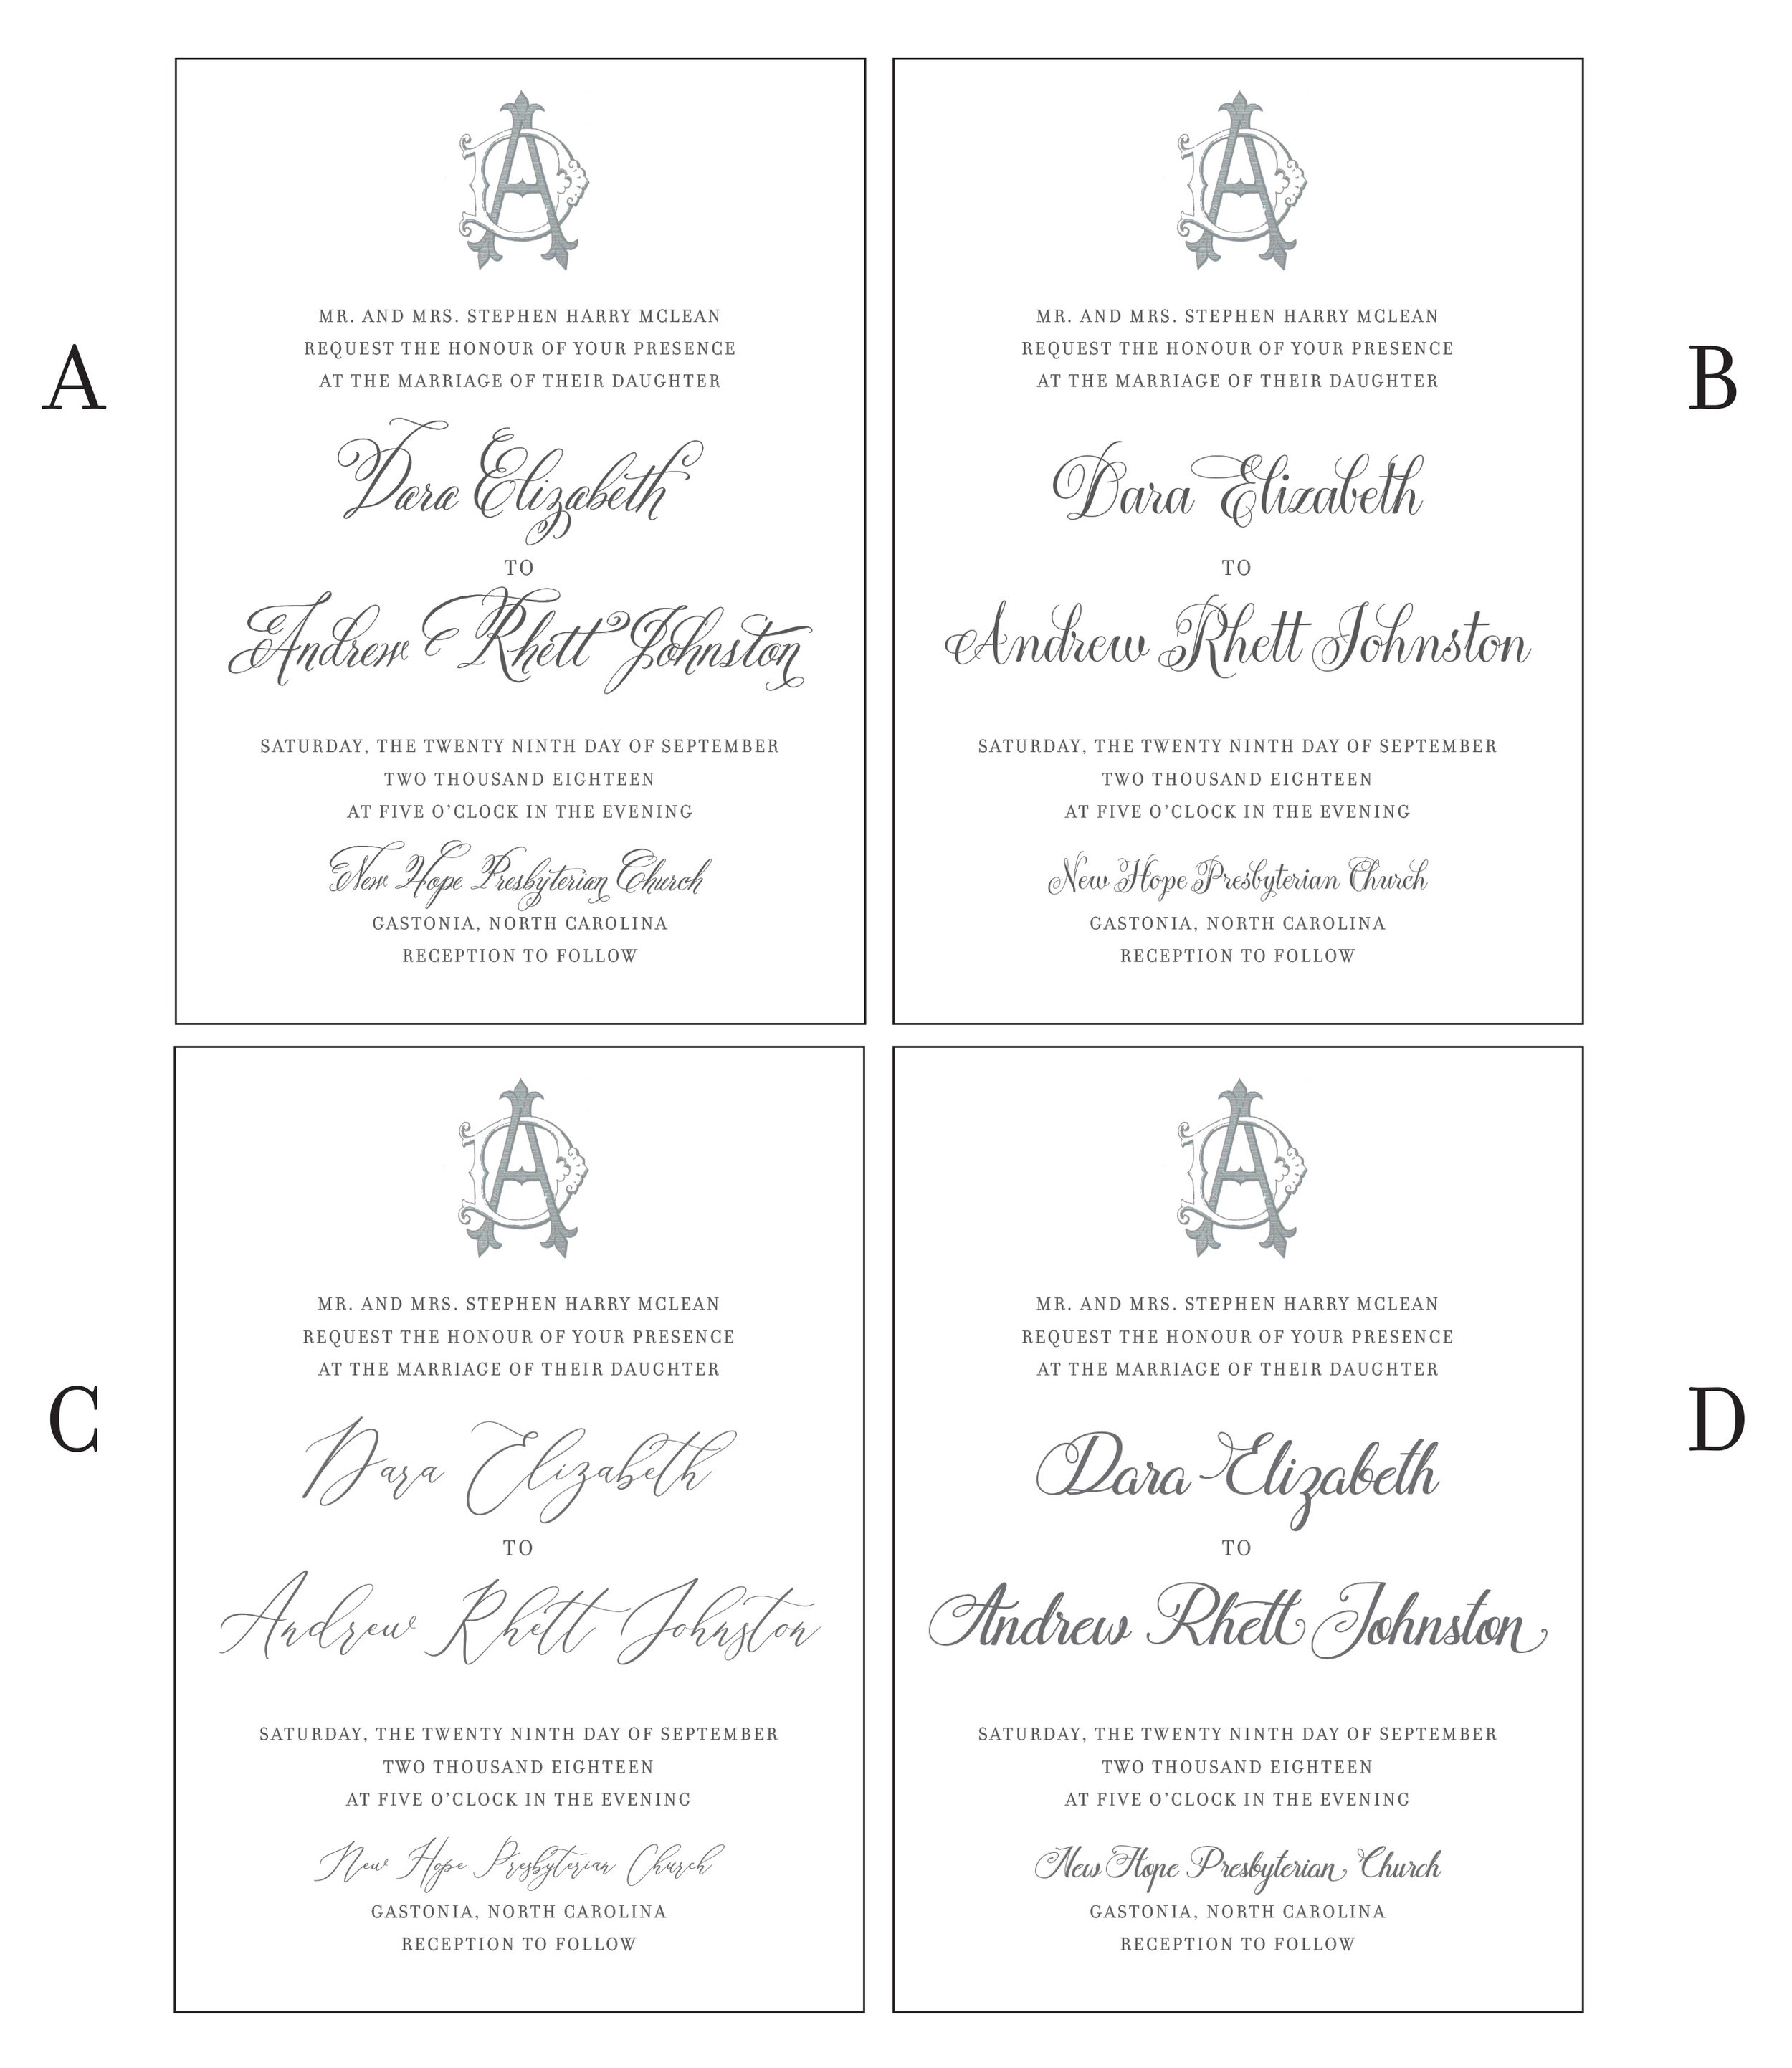 Dara_invitation_fonts.jpg